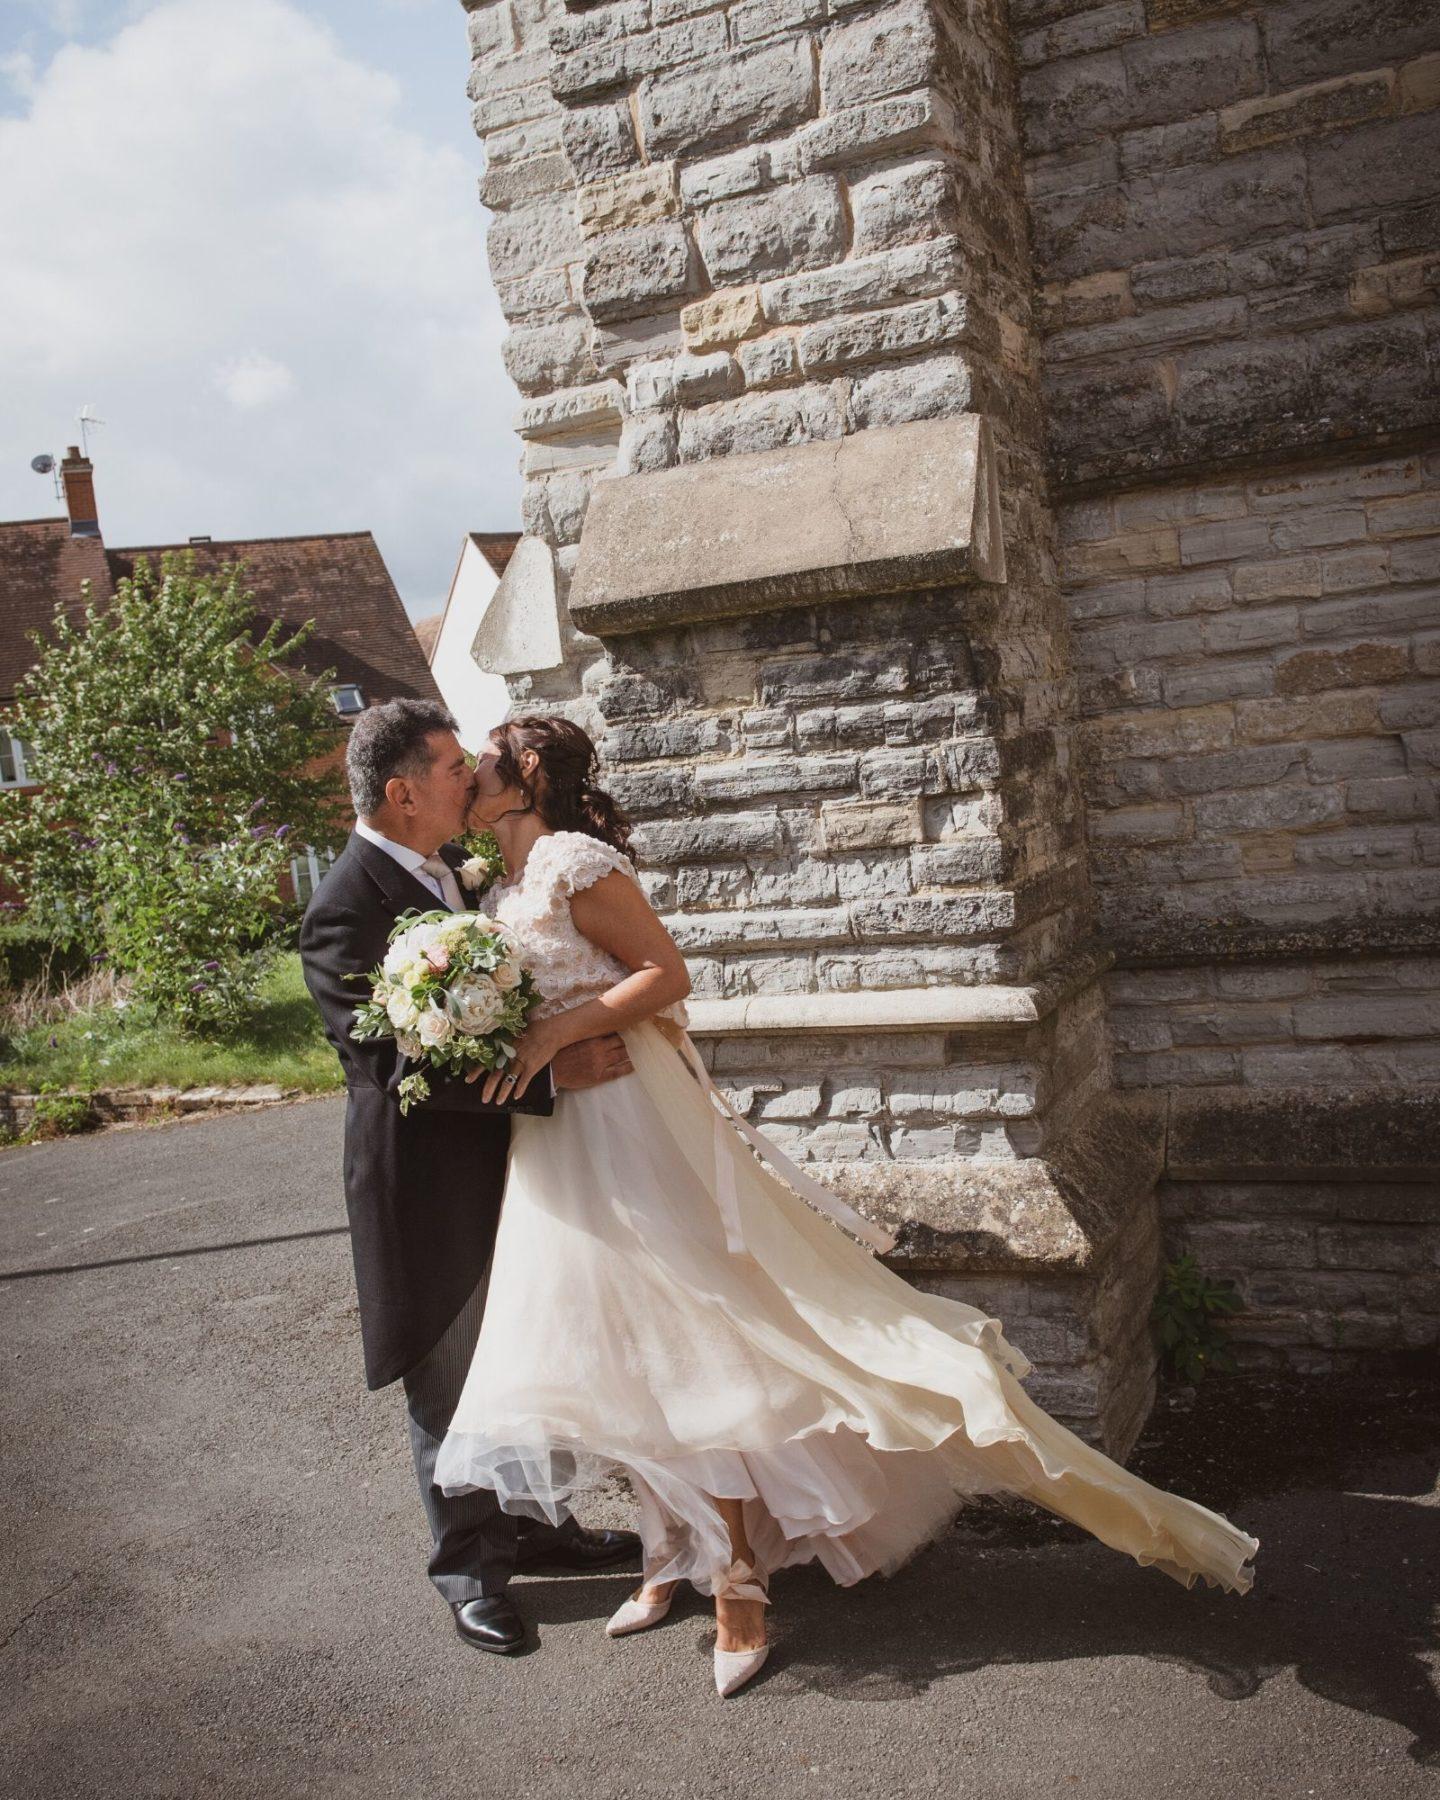 Bride wearing bespoke wedding dress from Boho Bride Boutique in Stratford-Upon-Avon